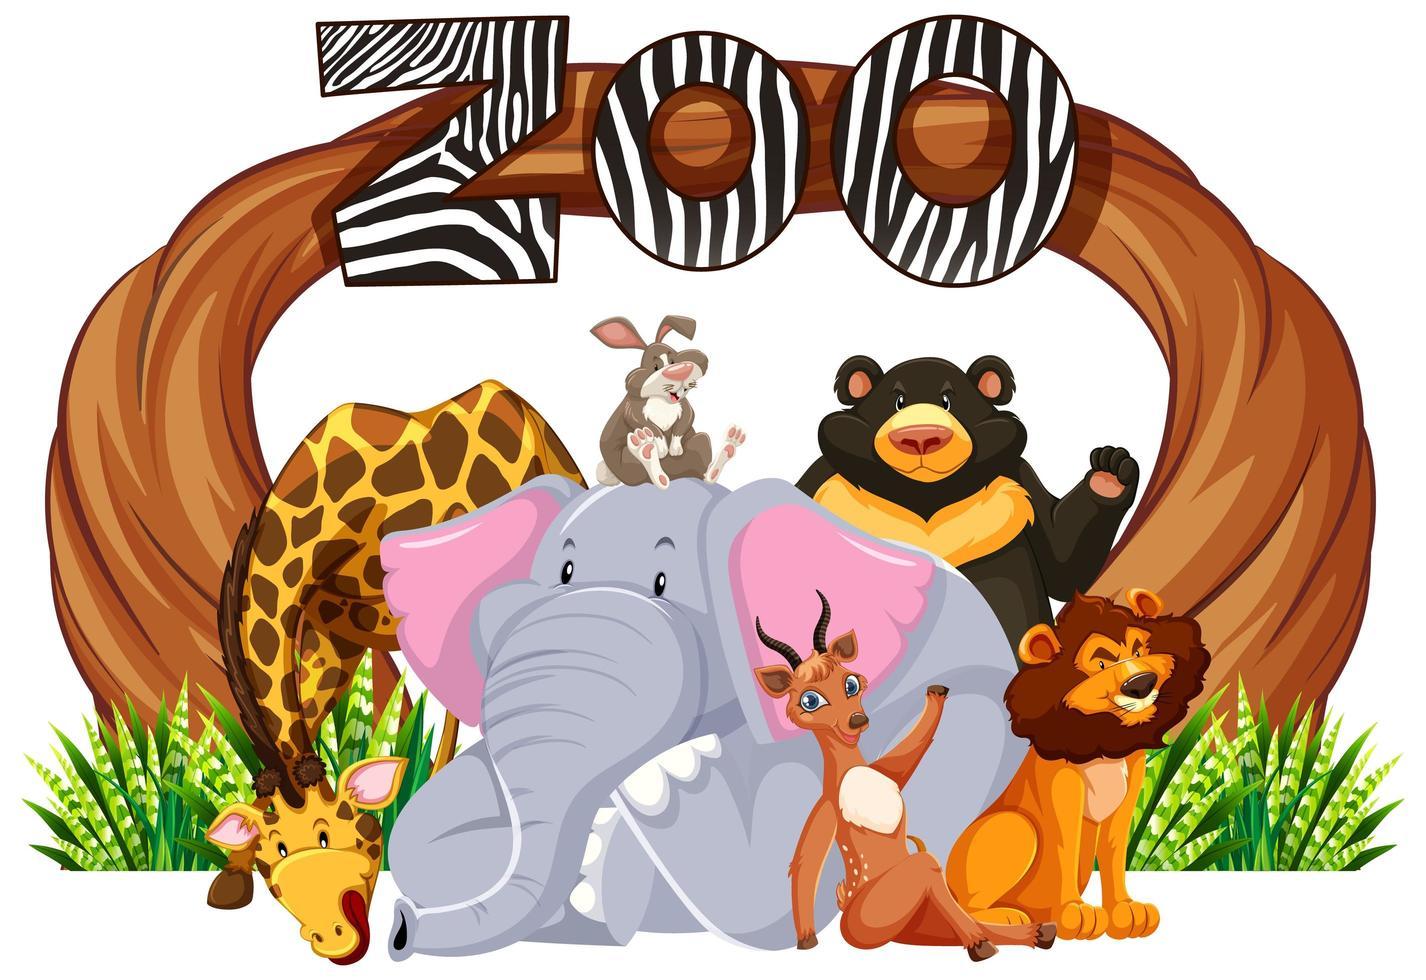 Zoo Entrance Sign With Cartoon Animals Download Free Vectors Clipart Graphics Vector Art